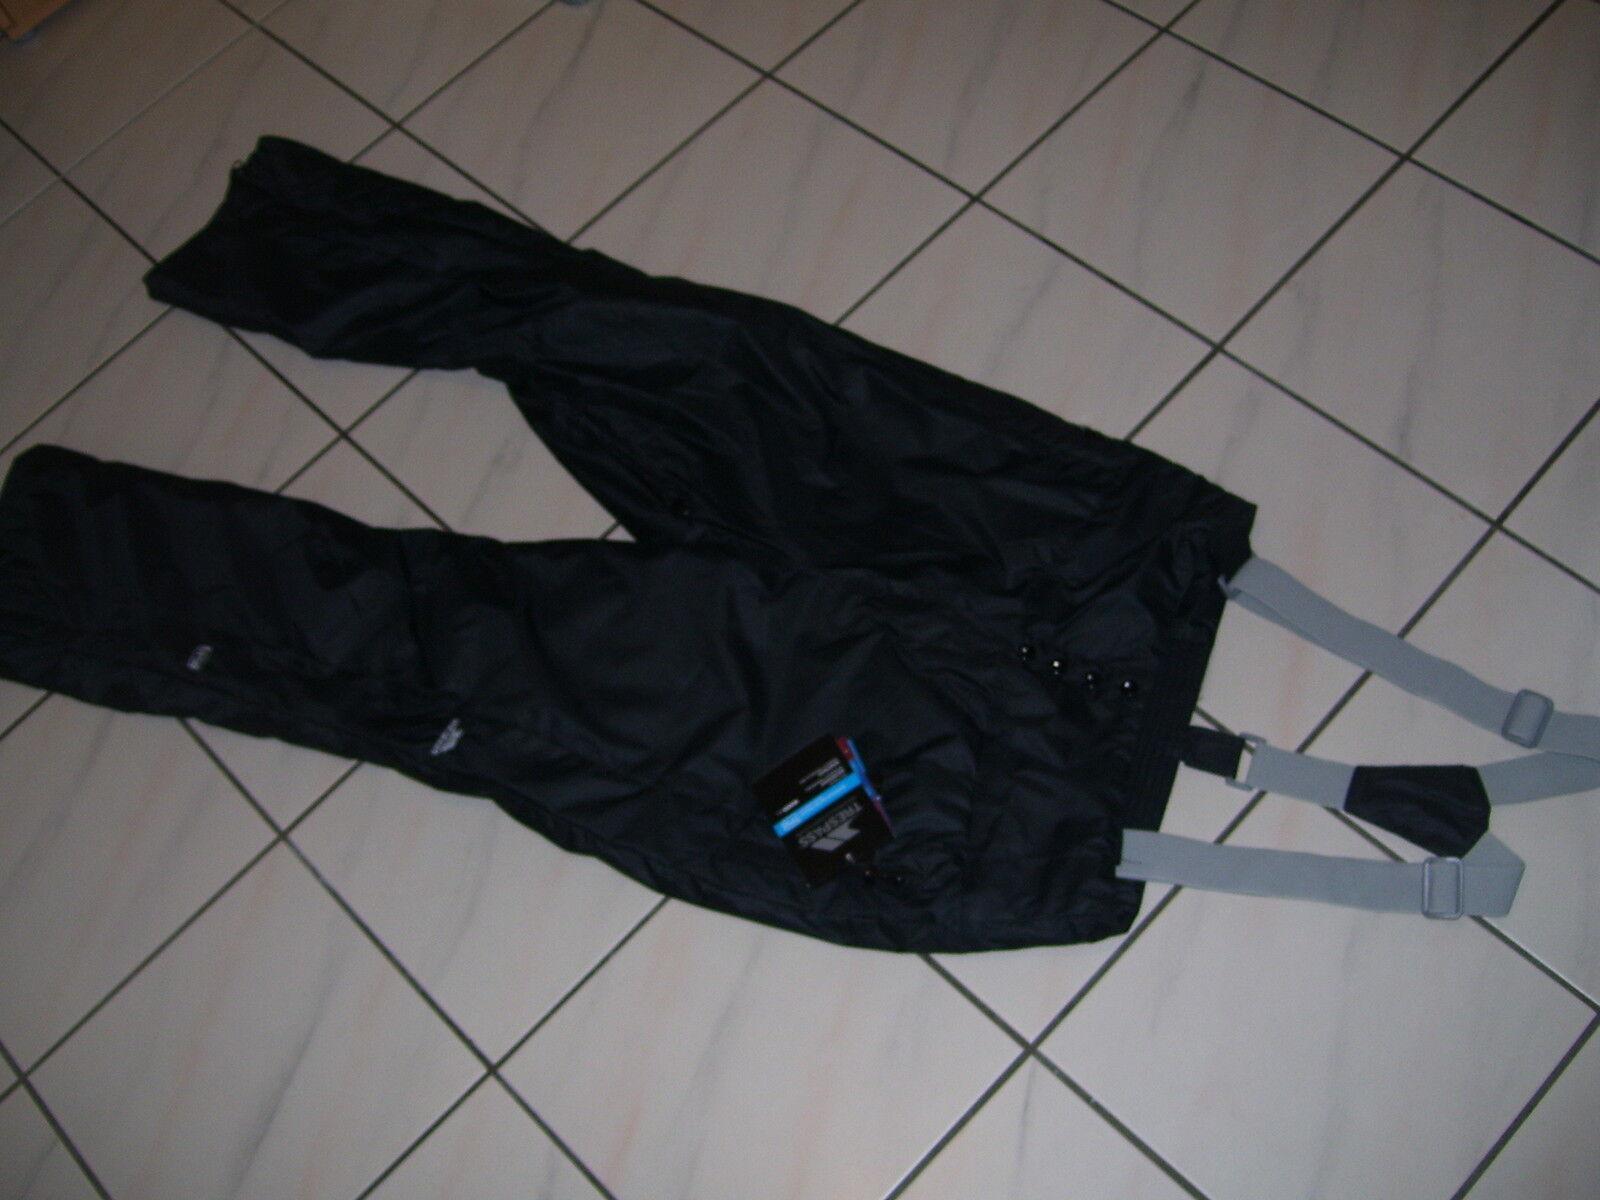 Trespass  Ski Trousers Women Size M TP50 Alexis Ladies TRS wateerproof coloheat  brand